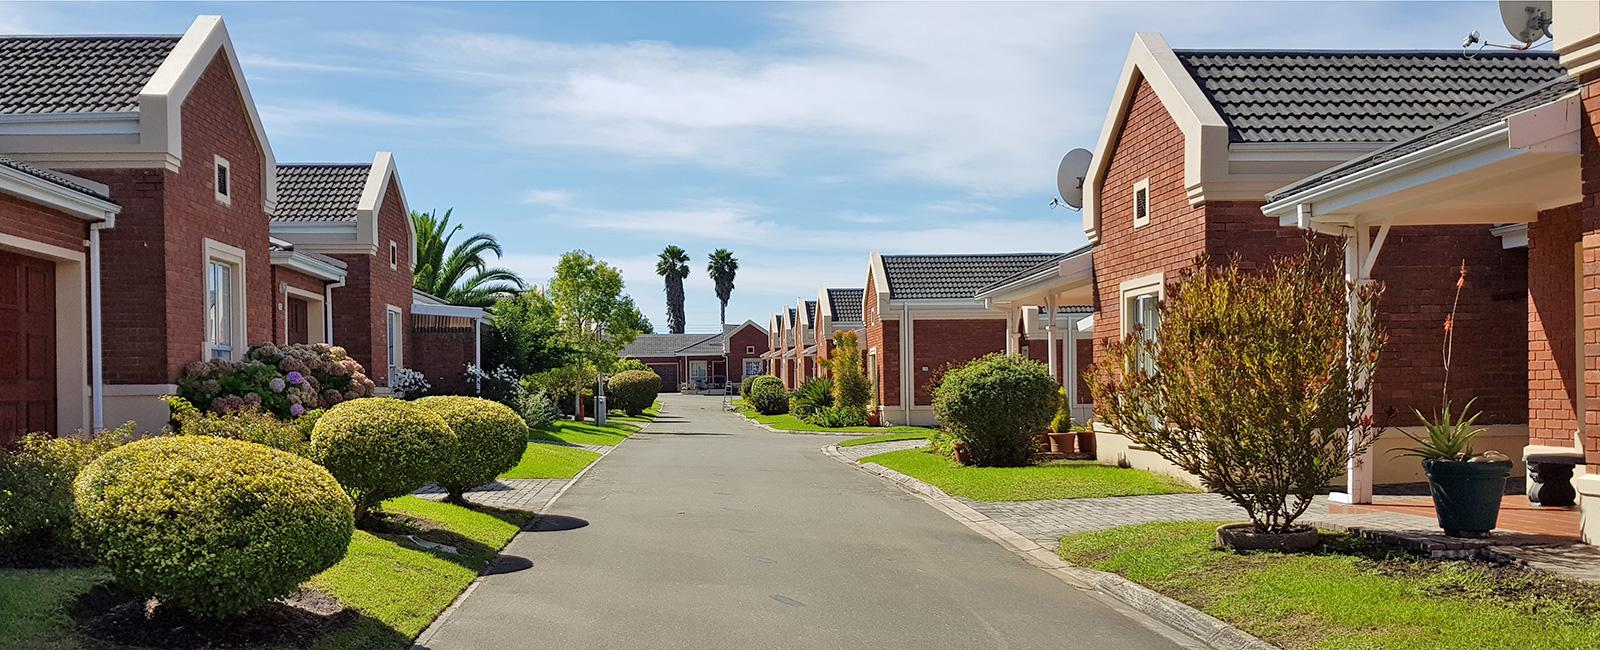 Bergville Retirement Village in George, Western Cape